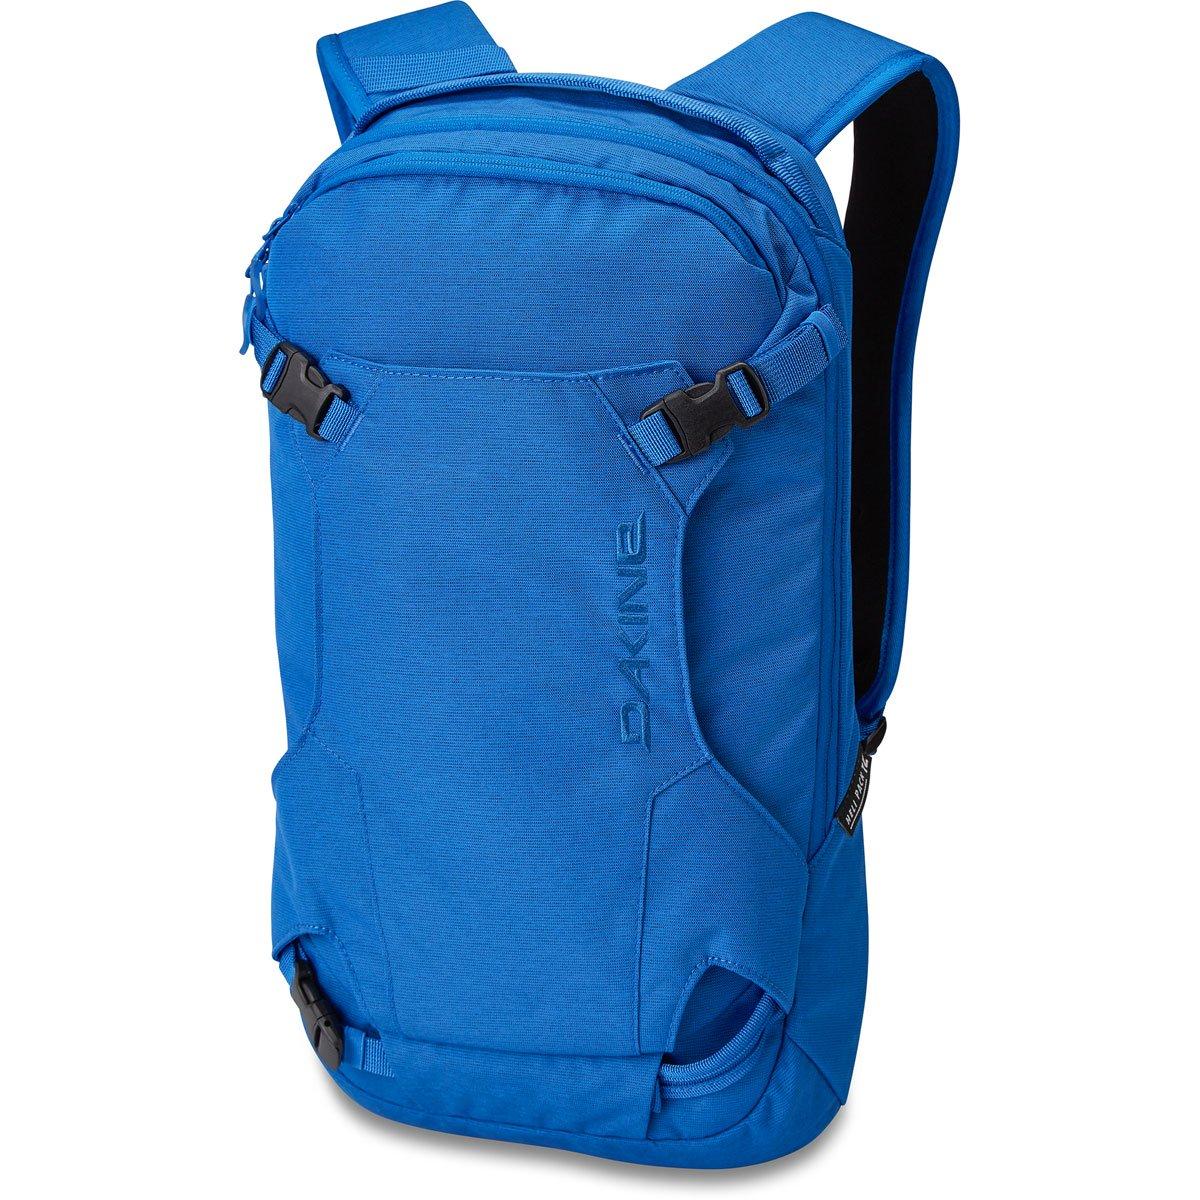 Dakine Heli Pack 12L - Cobalt Blue - Front View